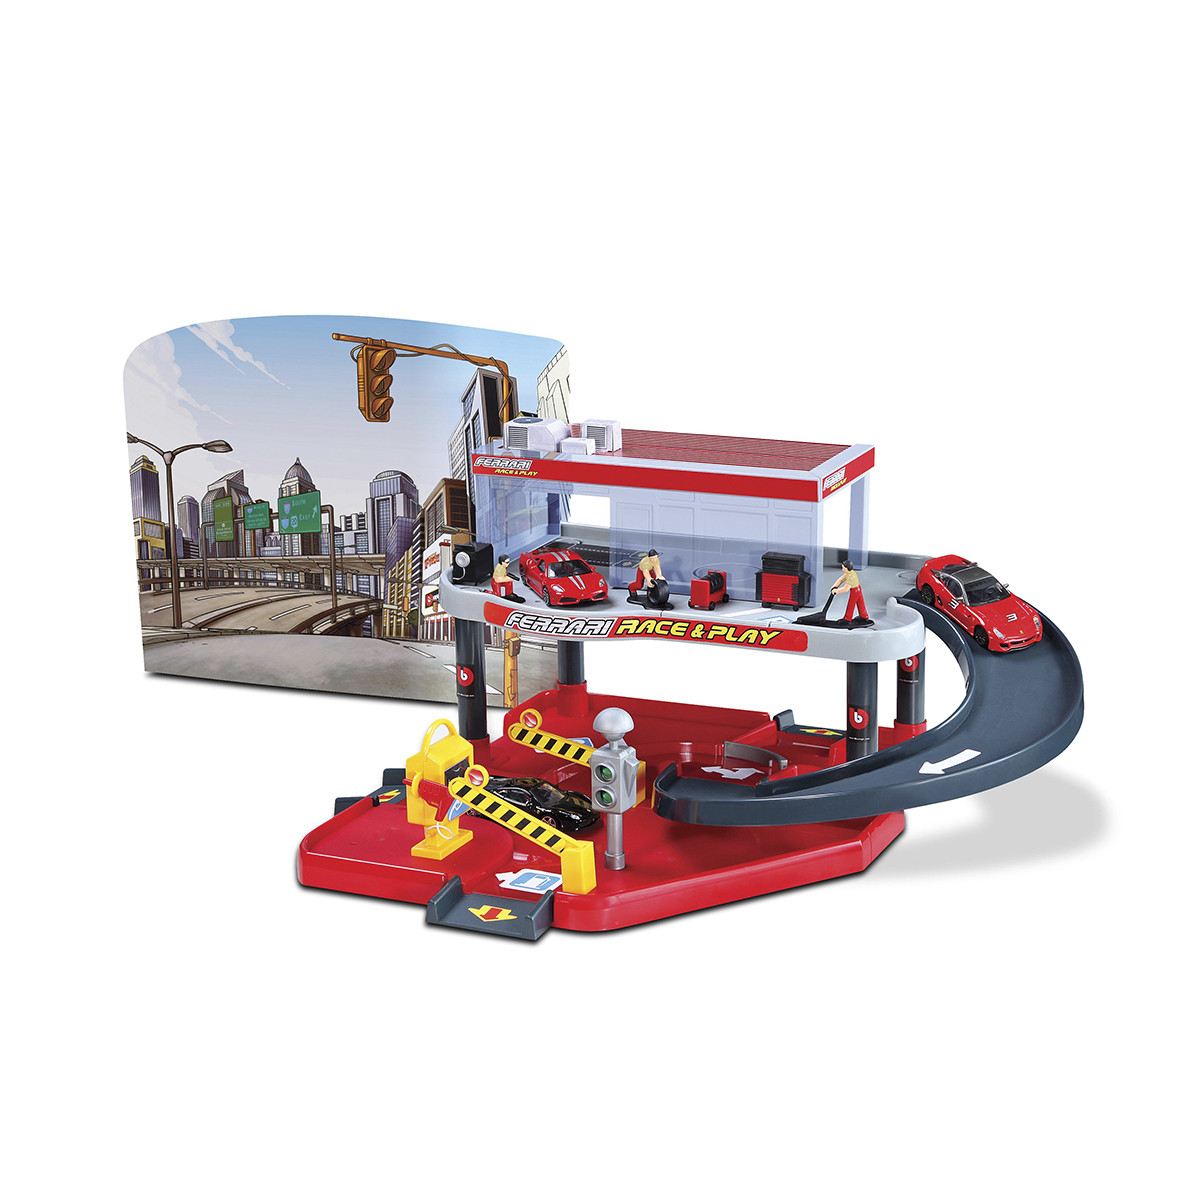 Bburago Игровой набор Гараж Ferrari, 1:43, 18-31231